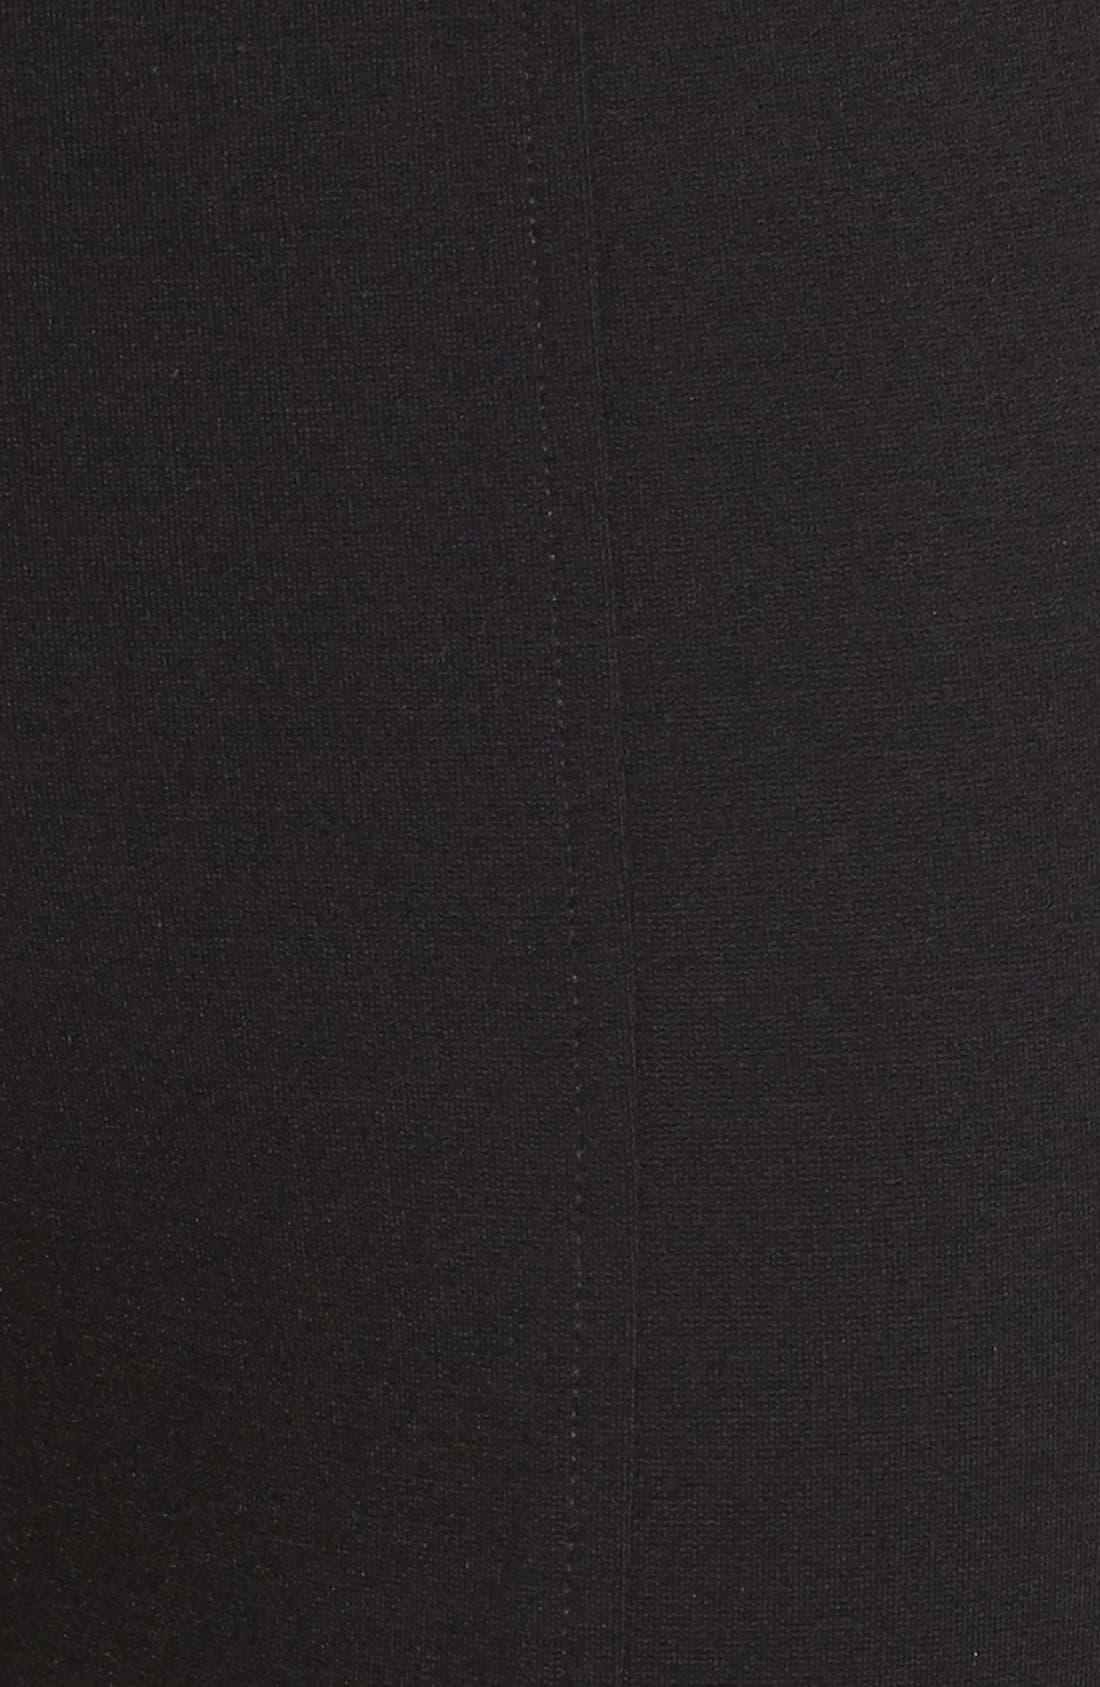 Betty Stretch Ankle Pants,                             Alternate thumbnail 5, color,                             Black